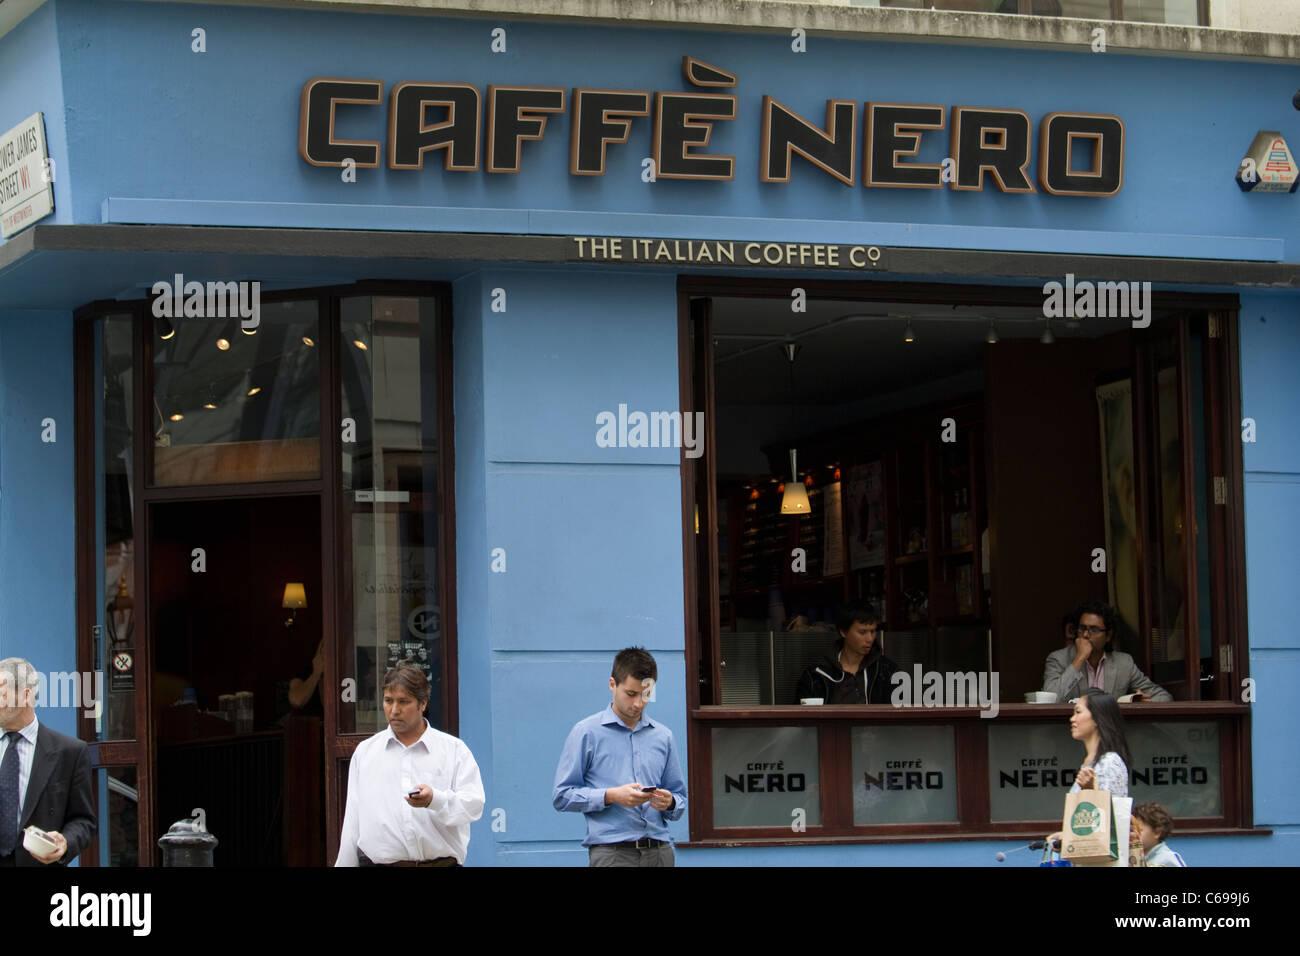 Caffe Nero coffee outlet Soho, London - Stock Image